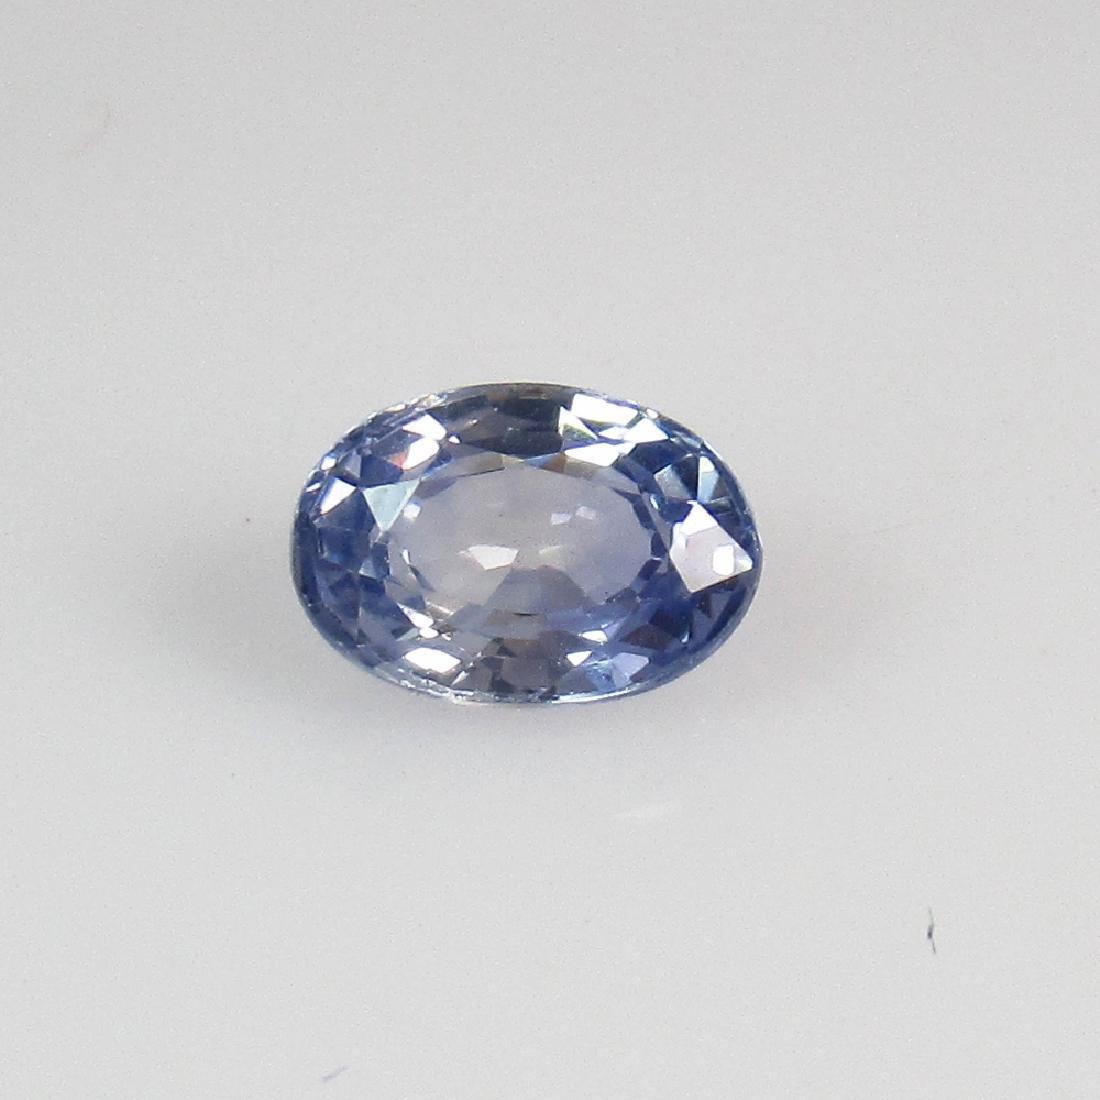 0.66 Ctw Natural Blue Sapphire 6X4 mm Oval Cut